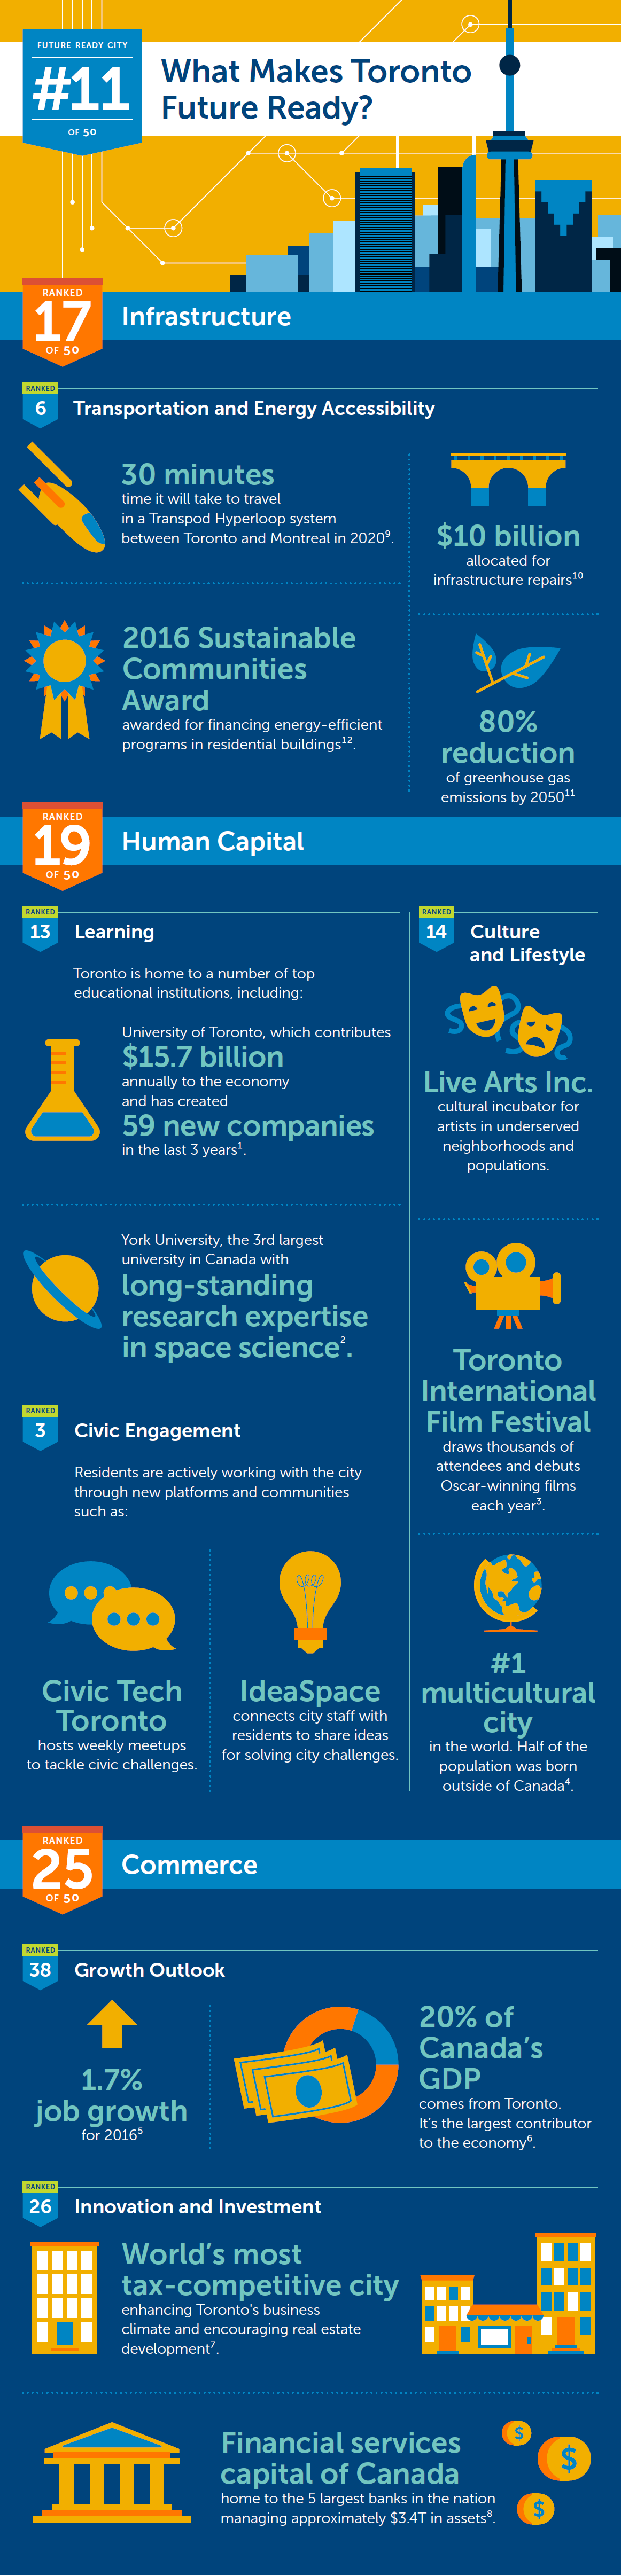 Toronto Future Ready Infographic